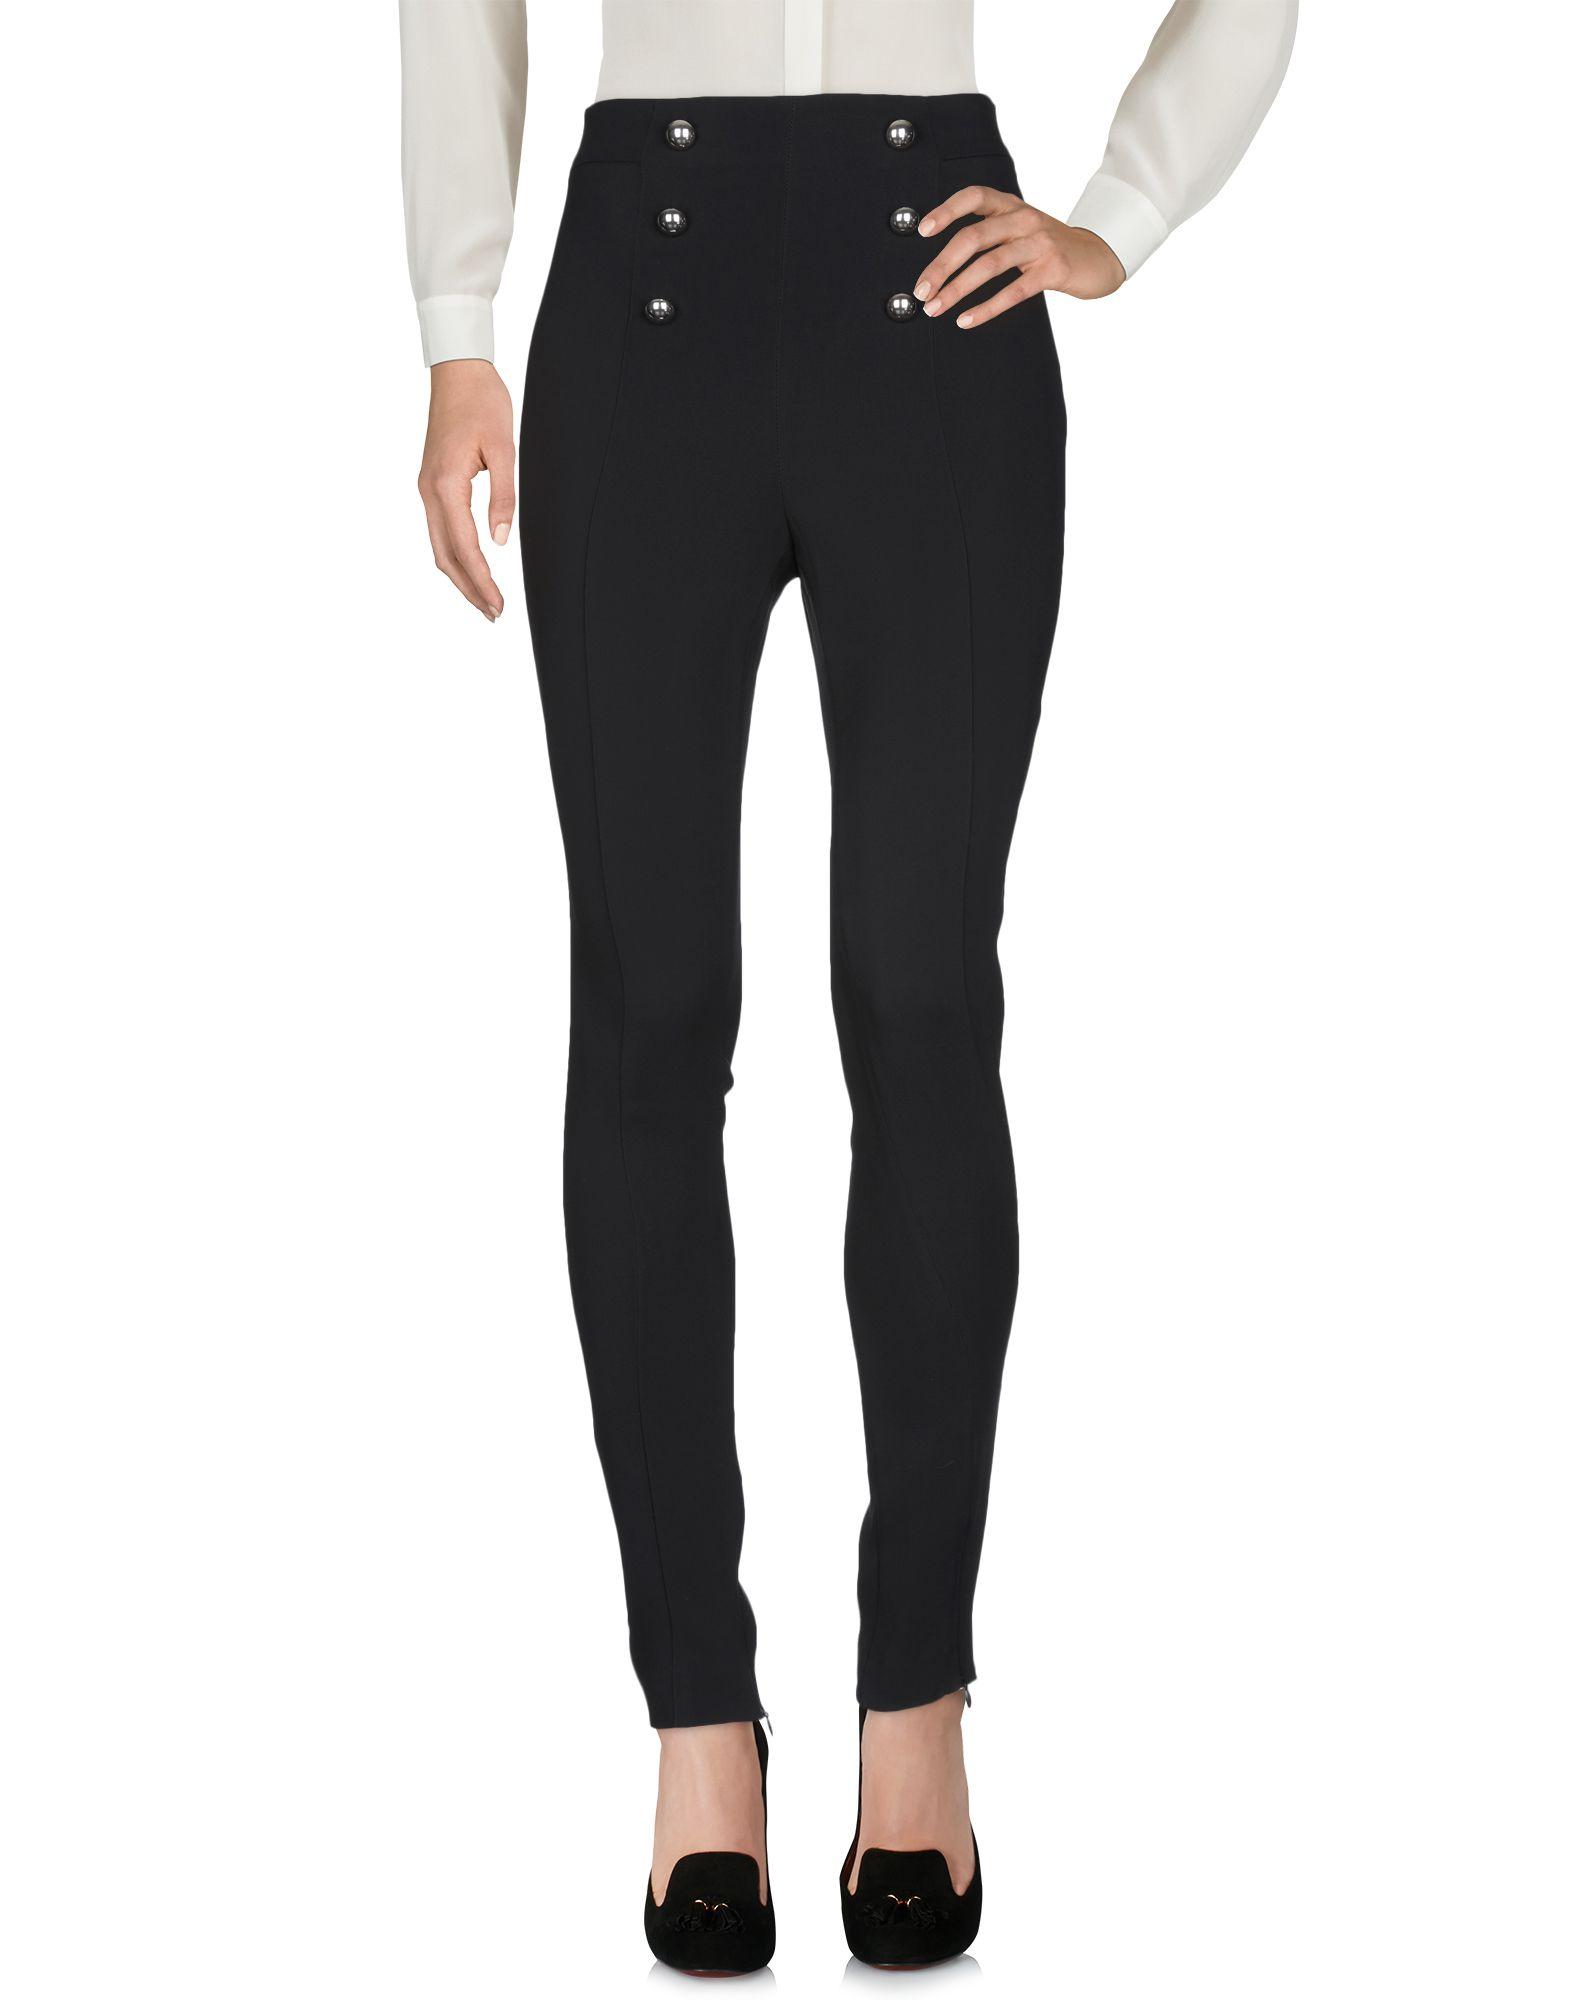 Pantalone Liu •Jo donna - 13213257XO 13213257XO  zu verkaufen